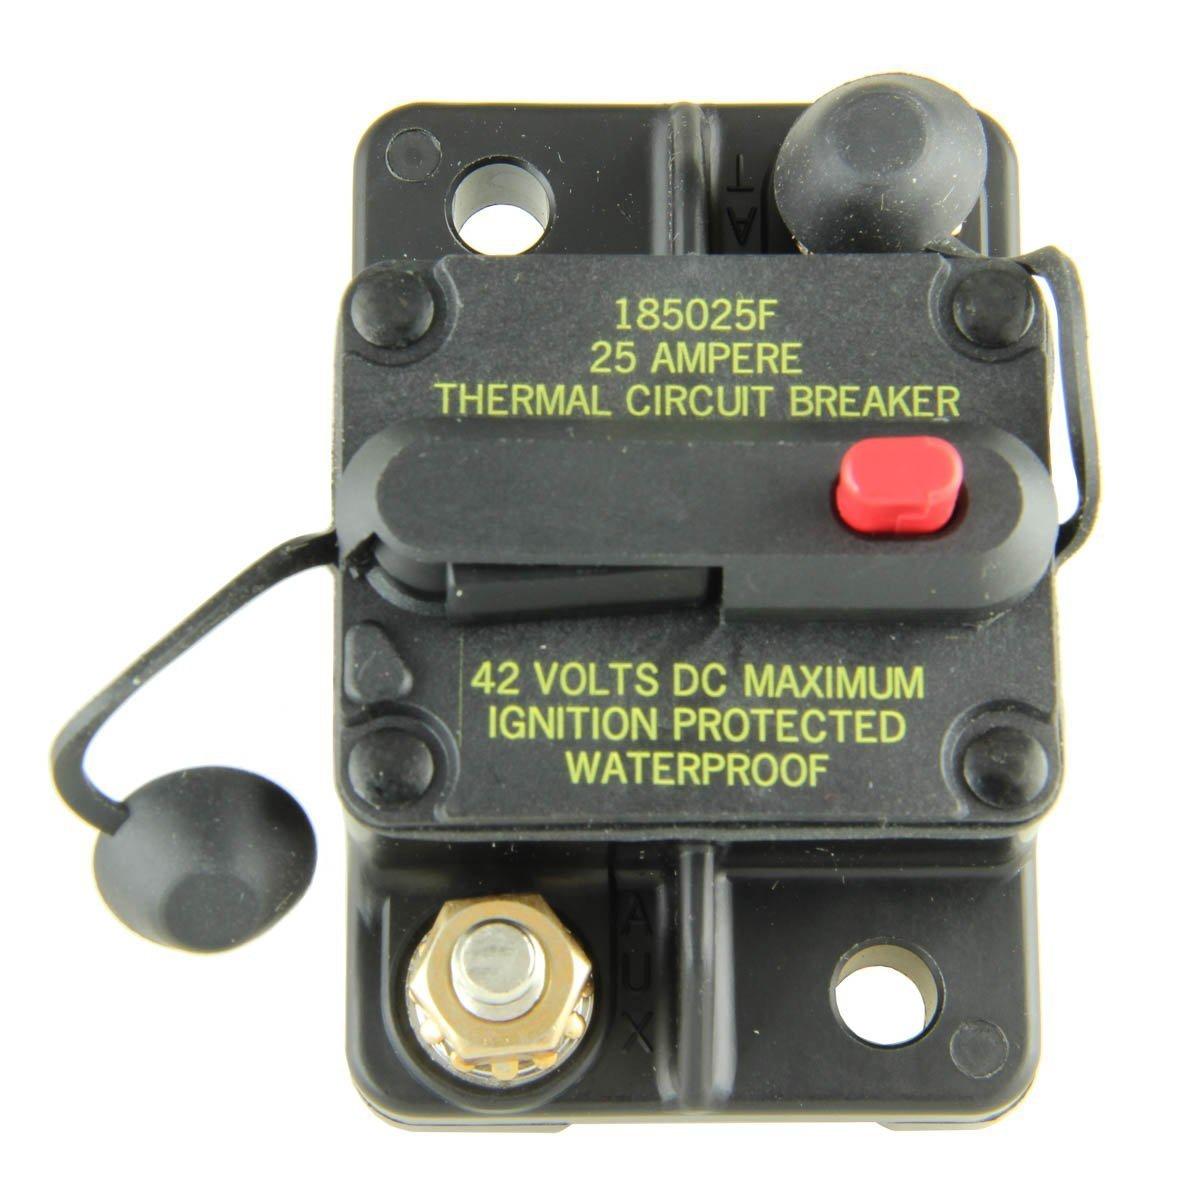 Bussmann CB185-25 Surface-Mount Circuit Breakers, 25 Amps Cooper Bussmann